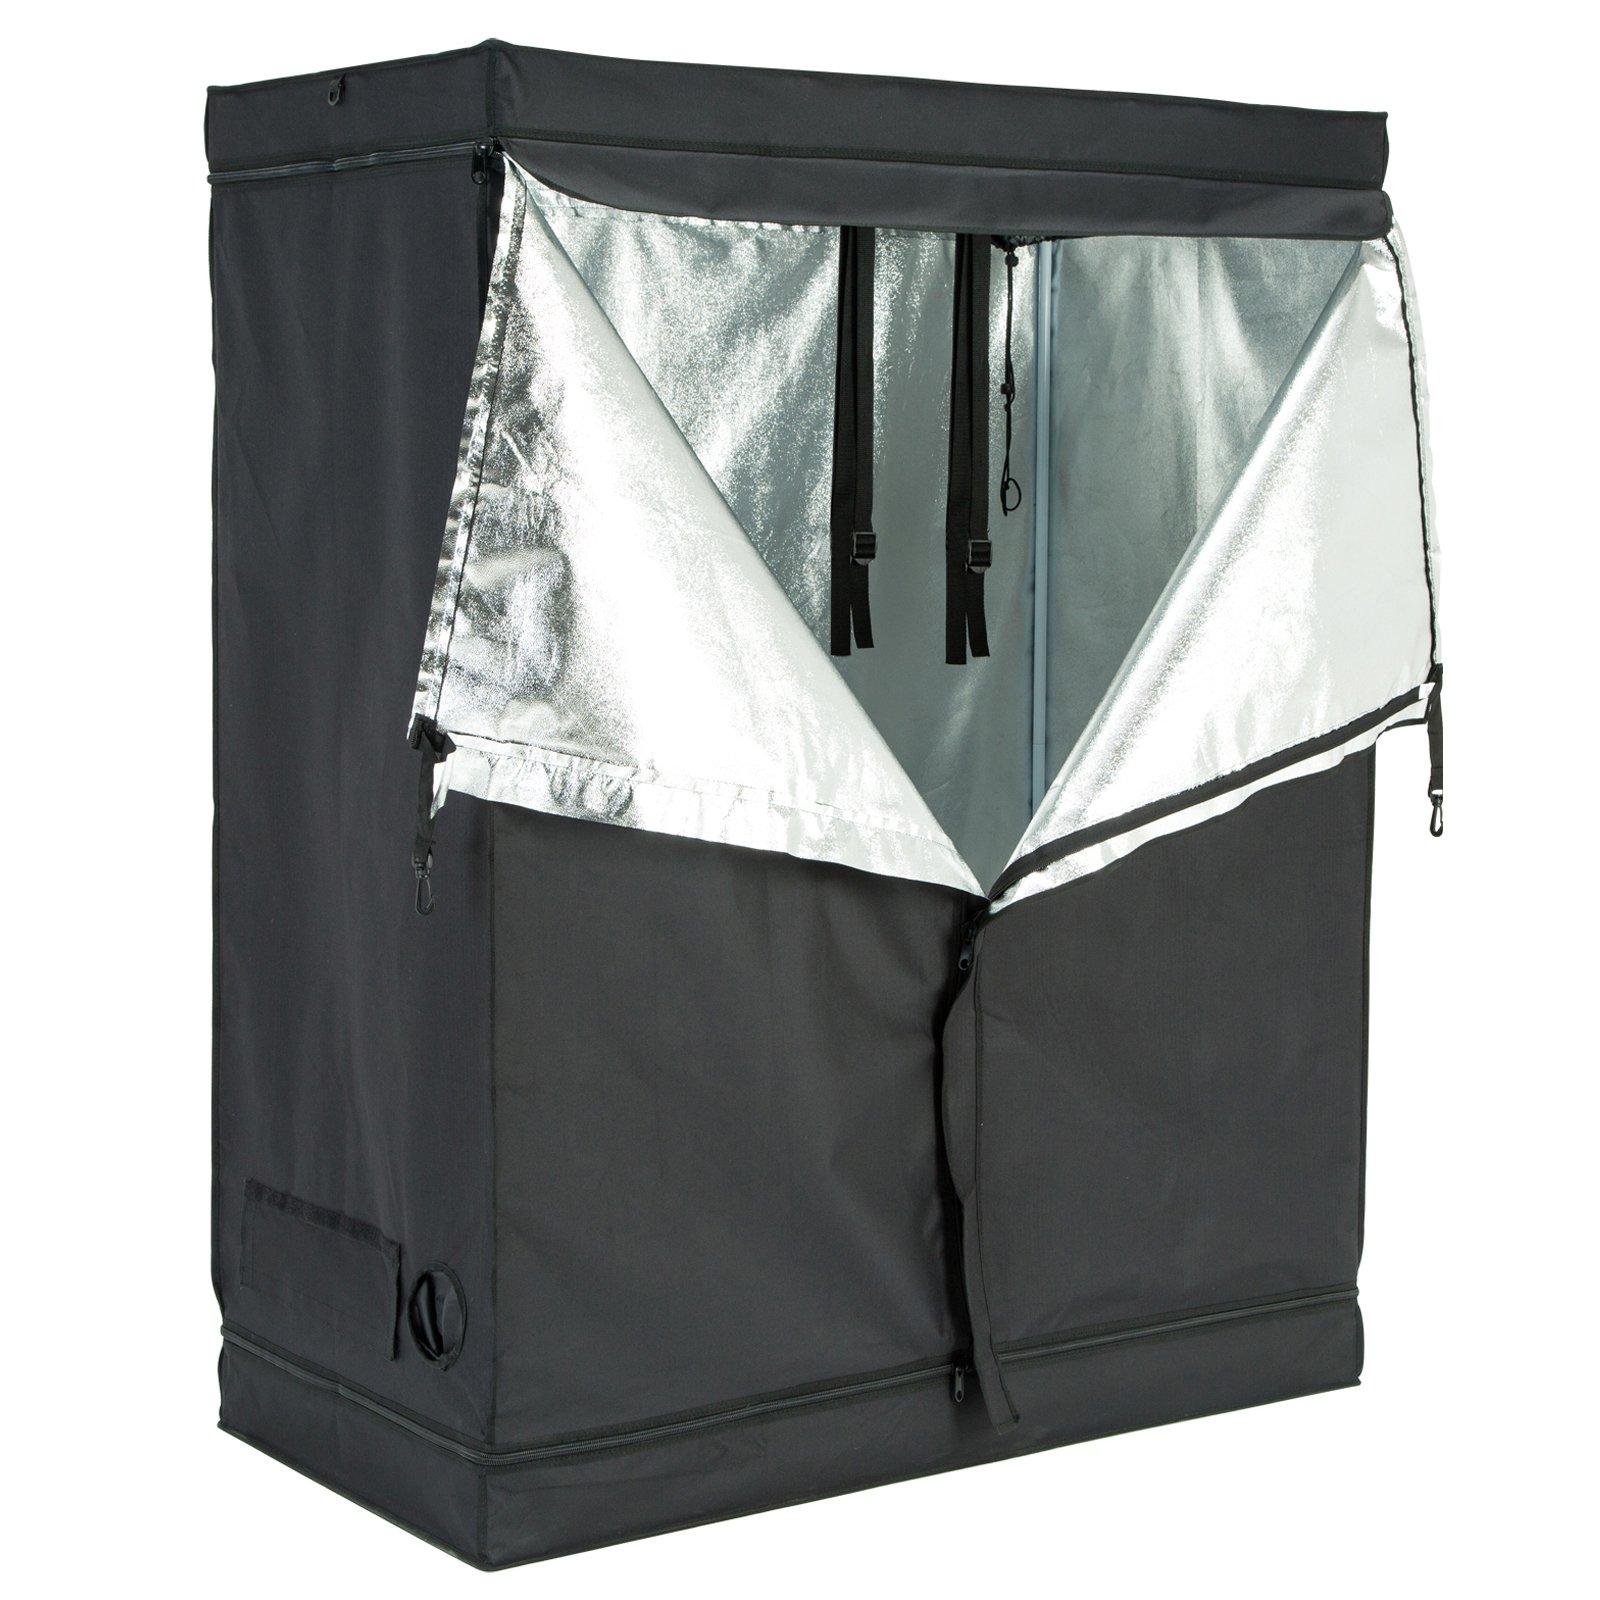 Uenjoy 48''x24''x60'' Indoor Grow Tent Room Reflective 600D Mylar Hydroponic Non Toxic Hut